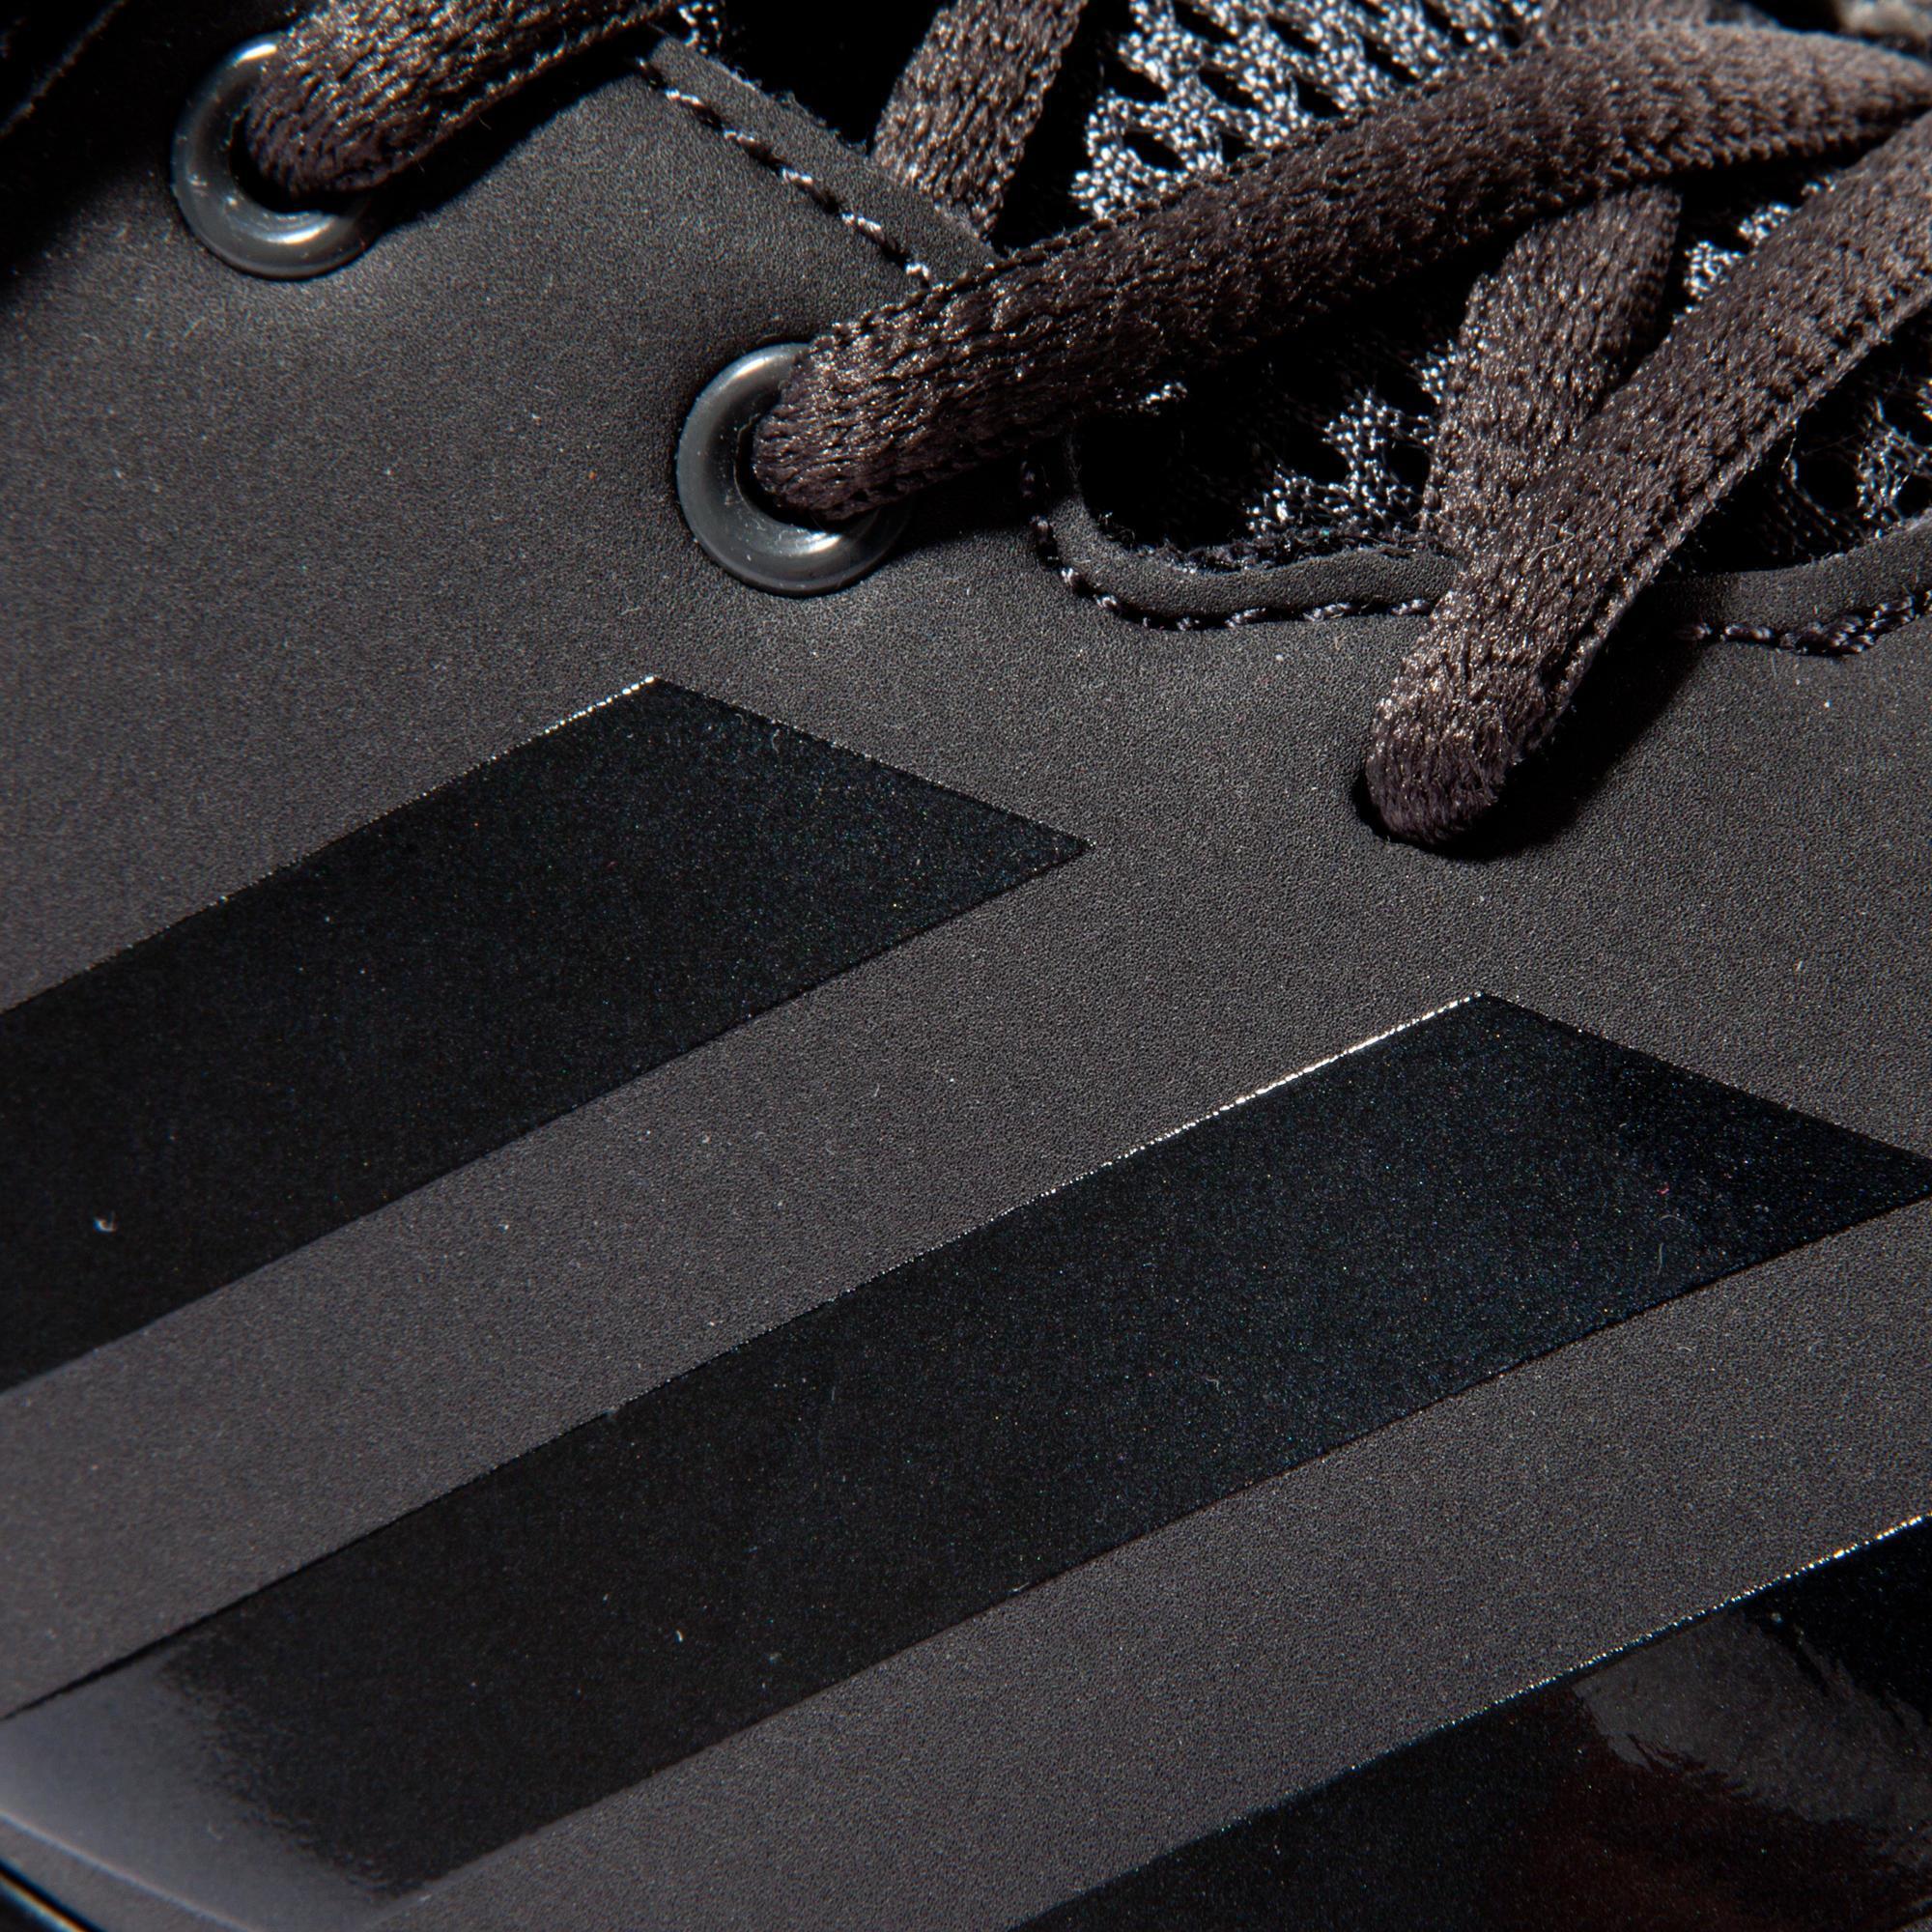 info for 29d24 5f089 3 1 Chaussure Adidas Decathlon Lift Haltérophilie Power RqBSwS4xI